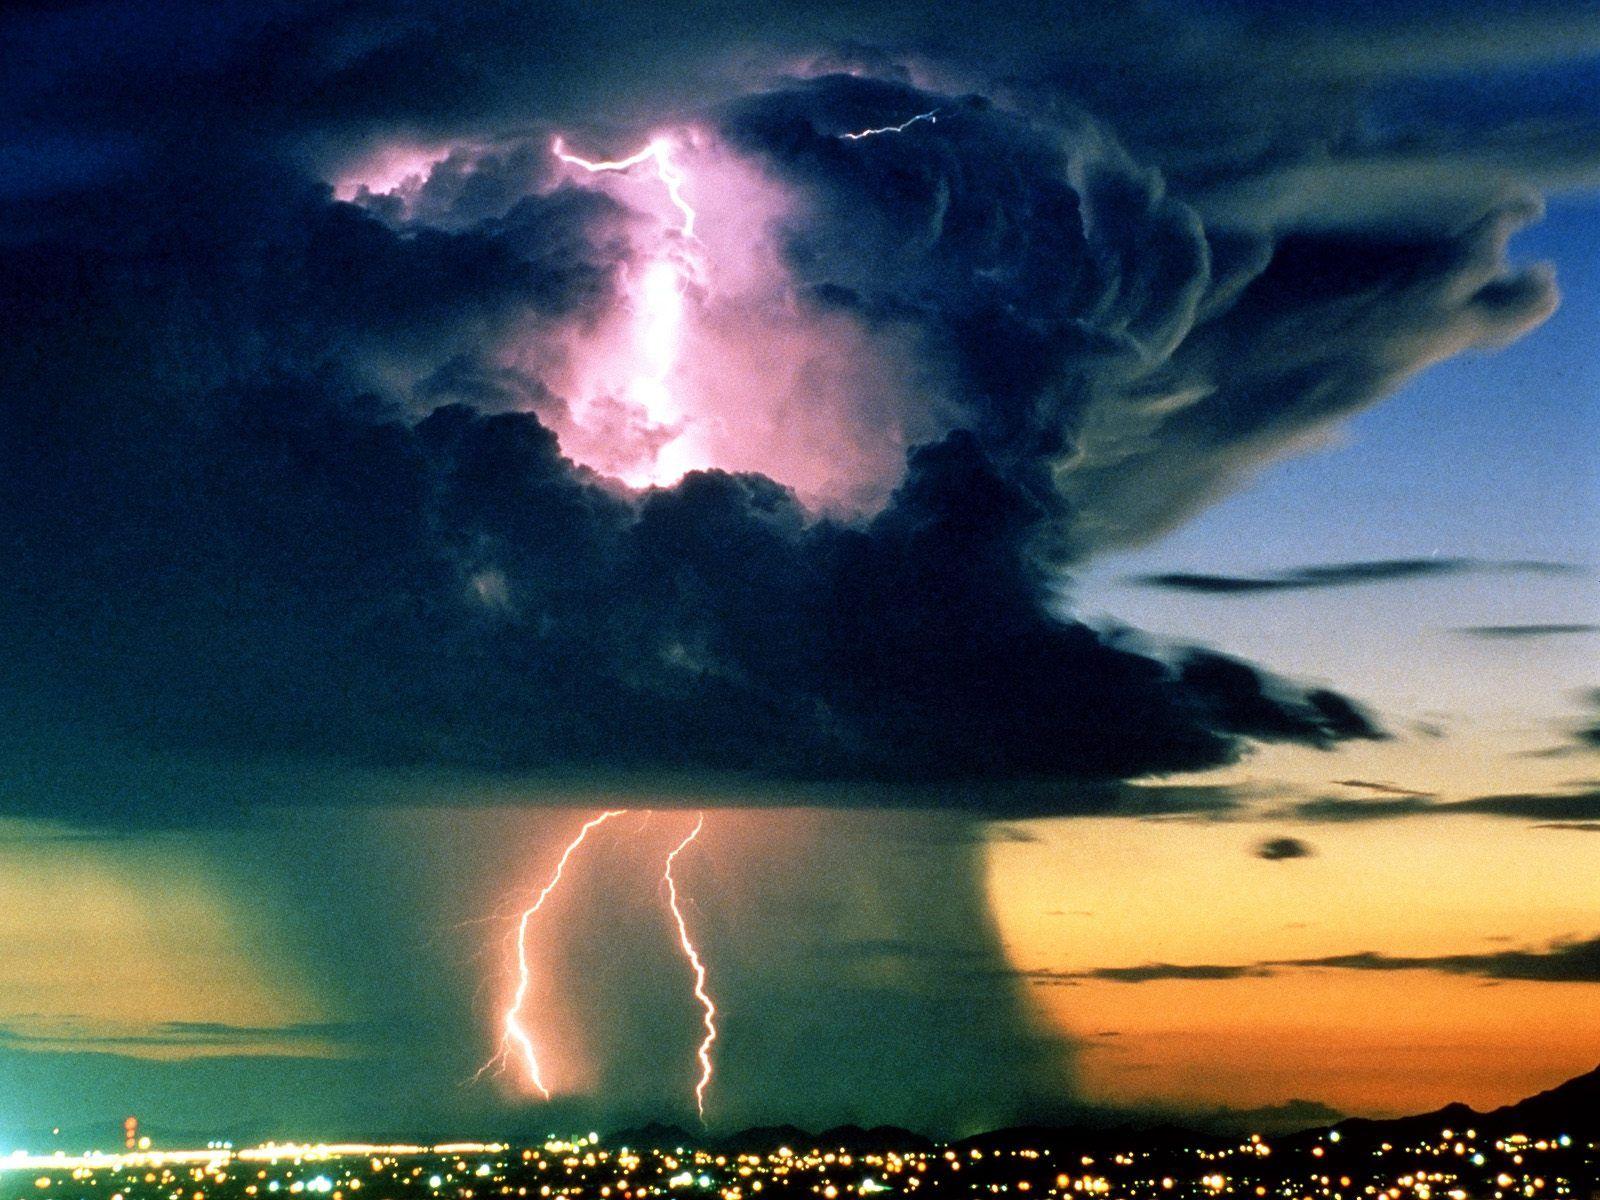 thunderhead clouds wallpaper - photo #27